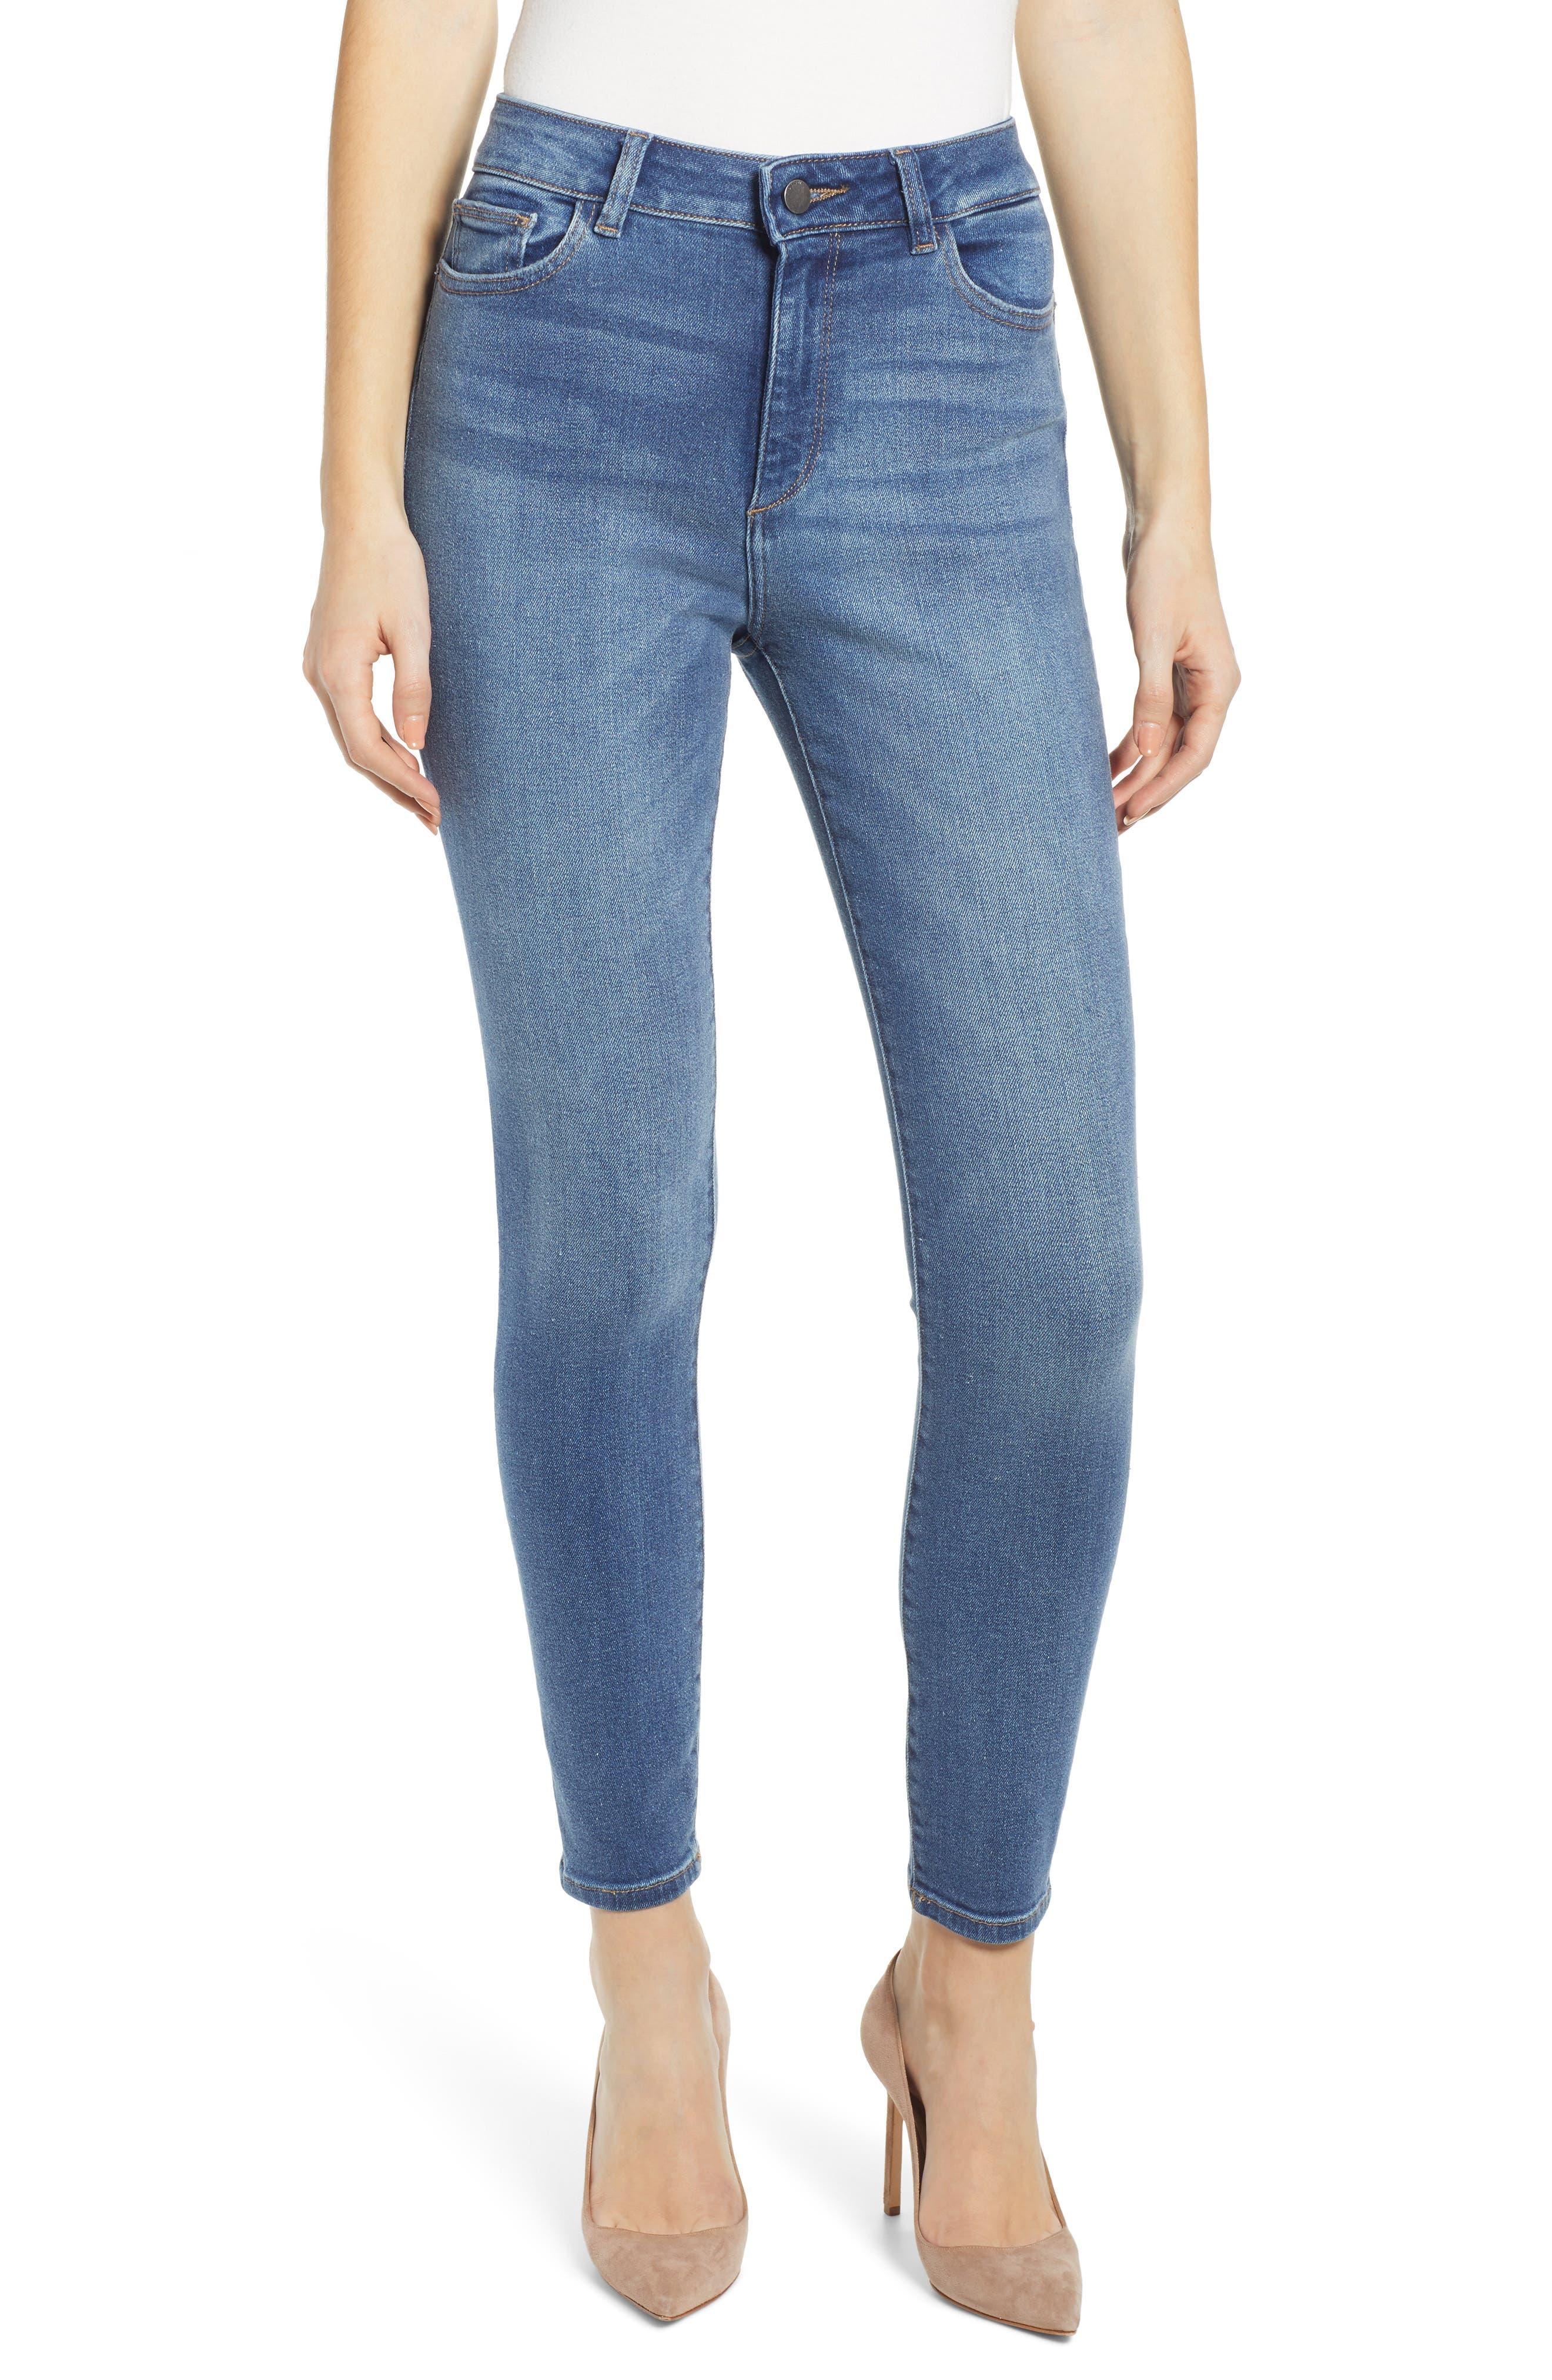 Farrow High Waist Crop Skinny Jeans by Dl1961